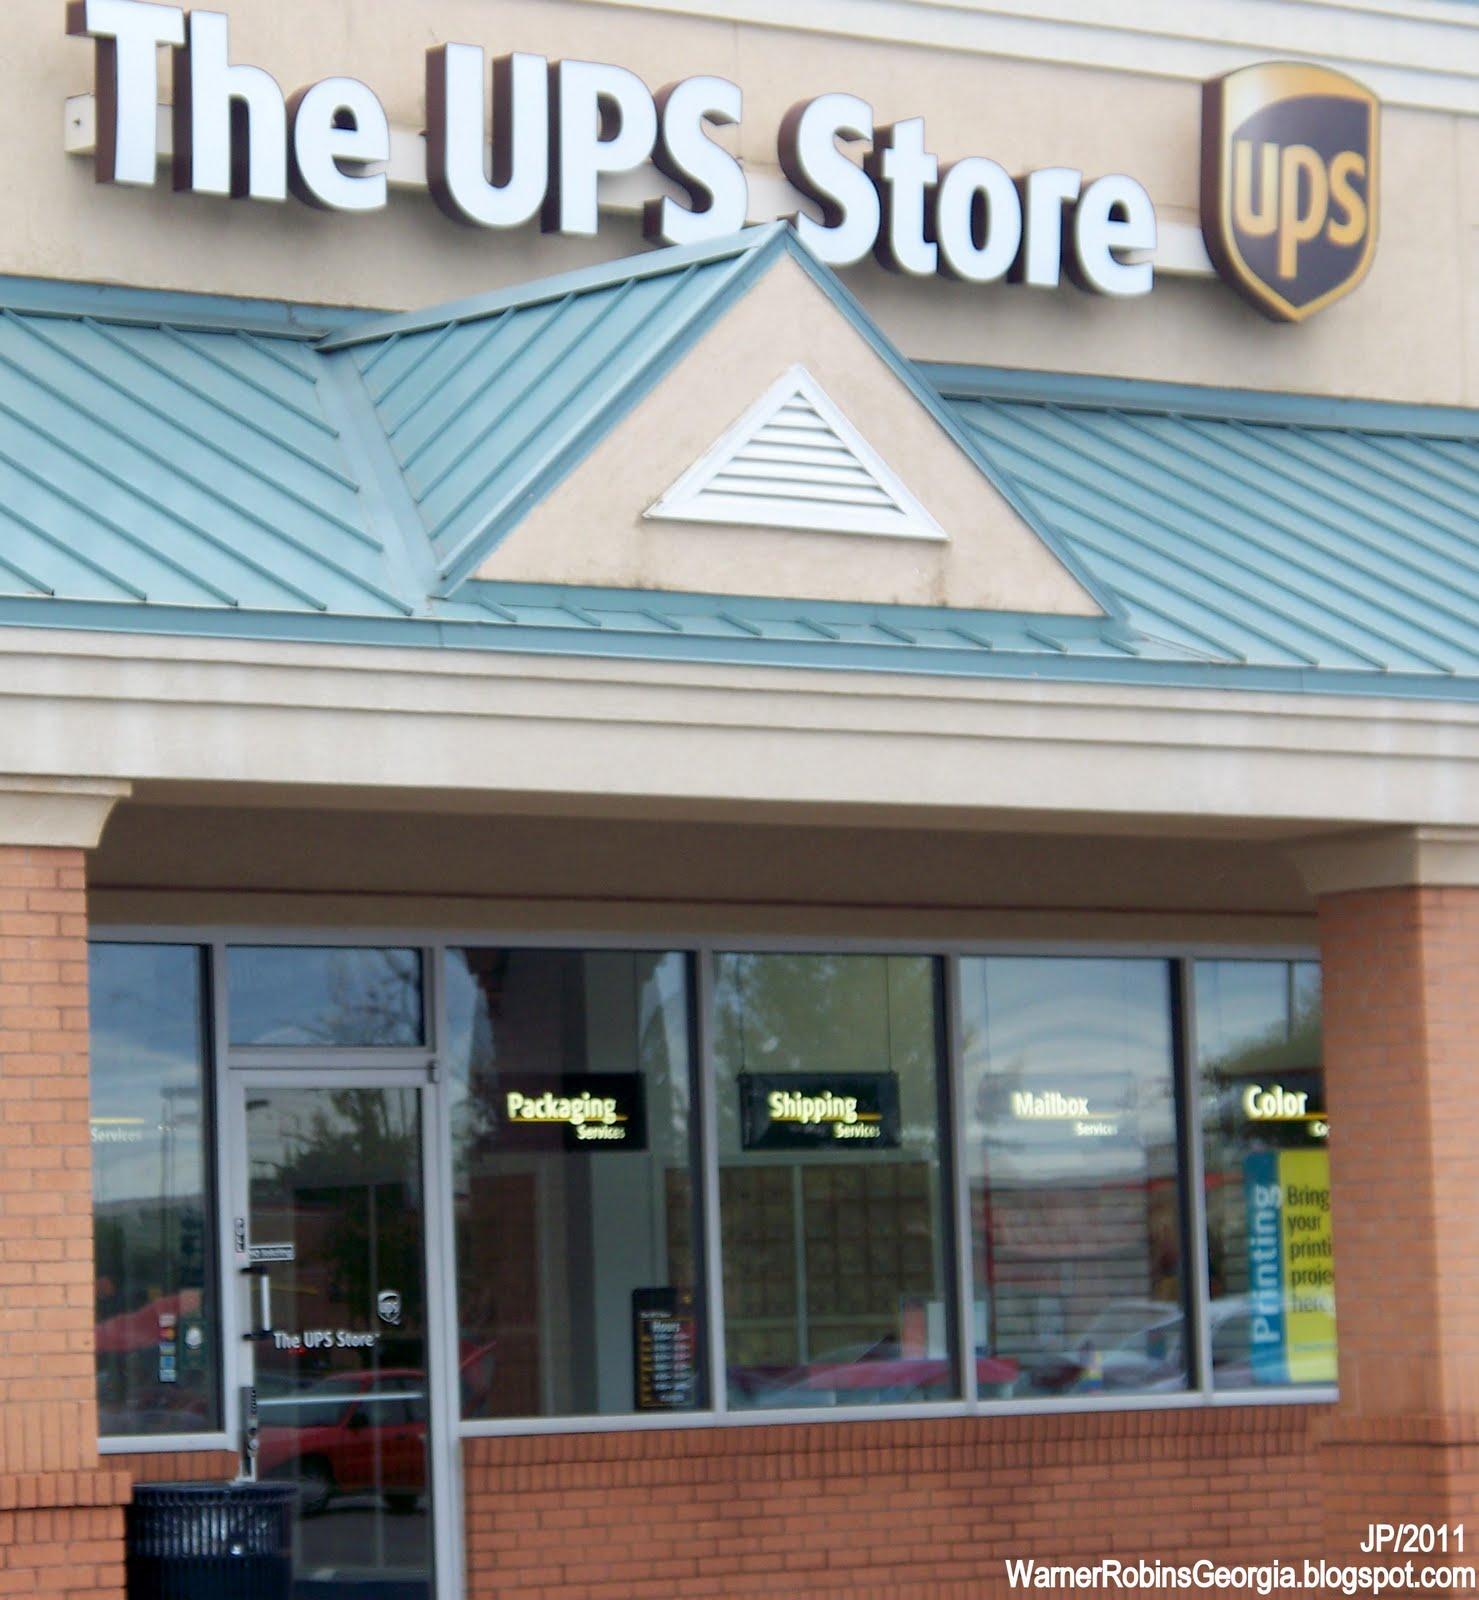 Car Dealerships In Warner Robins Ga >> WARNER ROBINS GEORGIA Air Force Base Houston Restaurant Bank Attorney Hospital Dept.Store Hotel ...